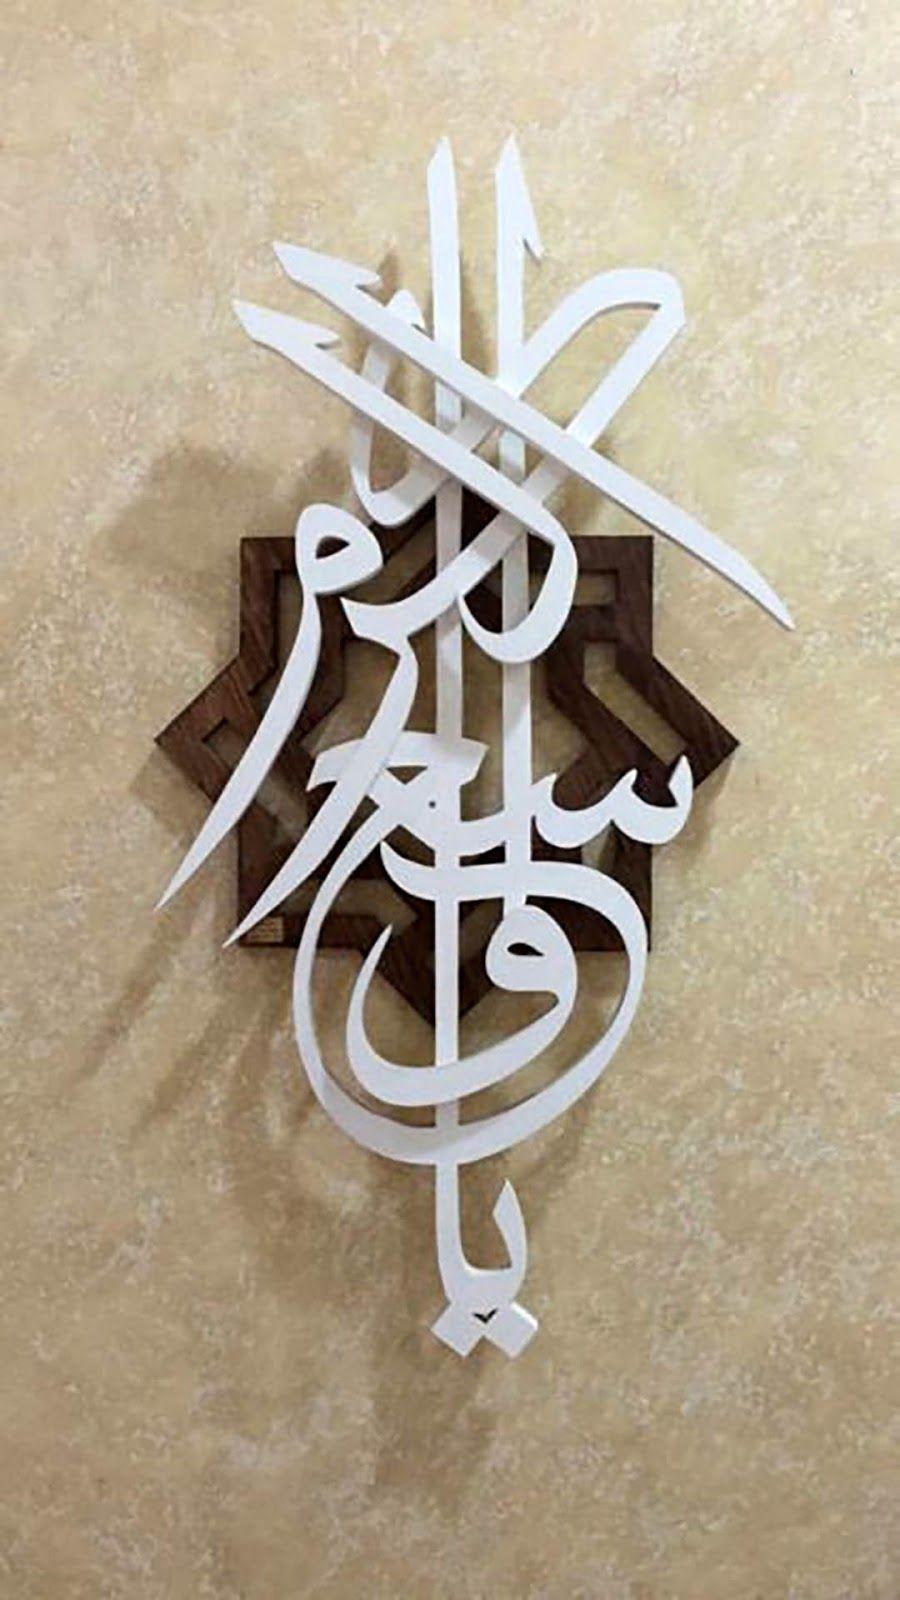 Kaligrafi Seni kontemporer, Seni kaligrafi, Seni arab